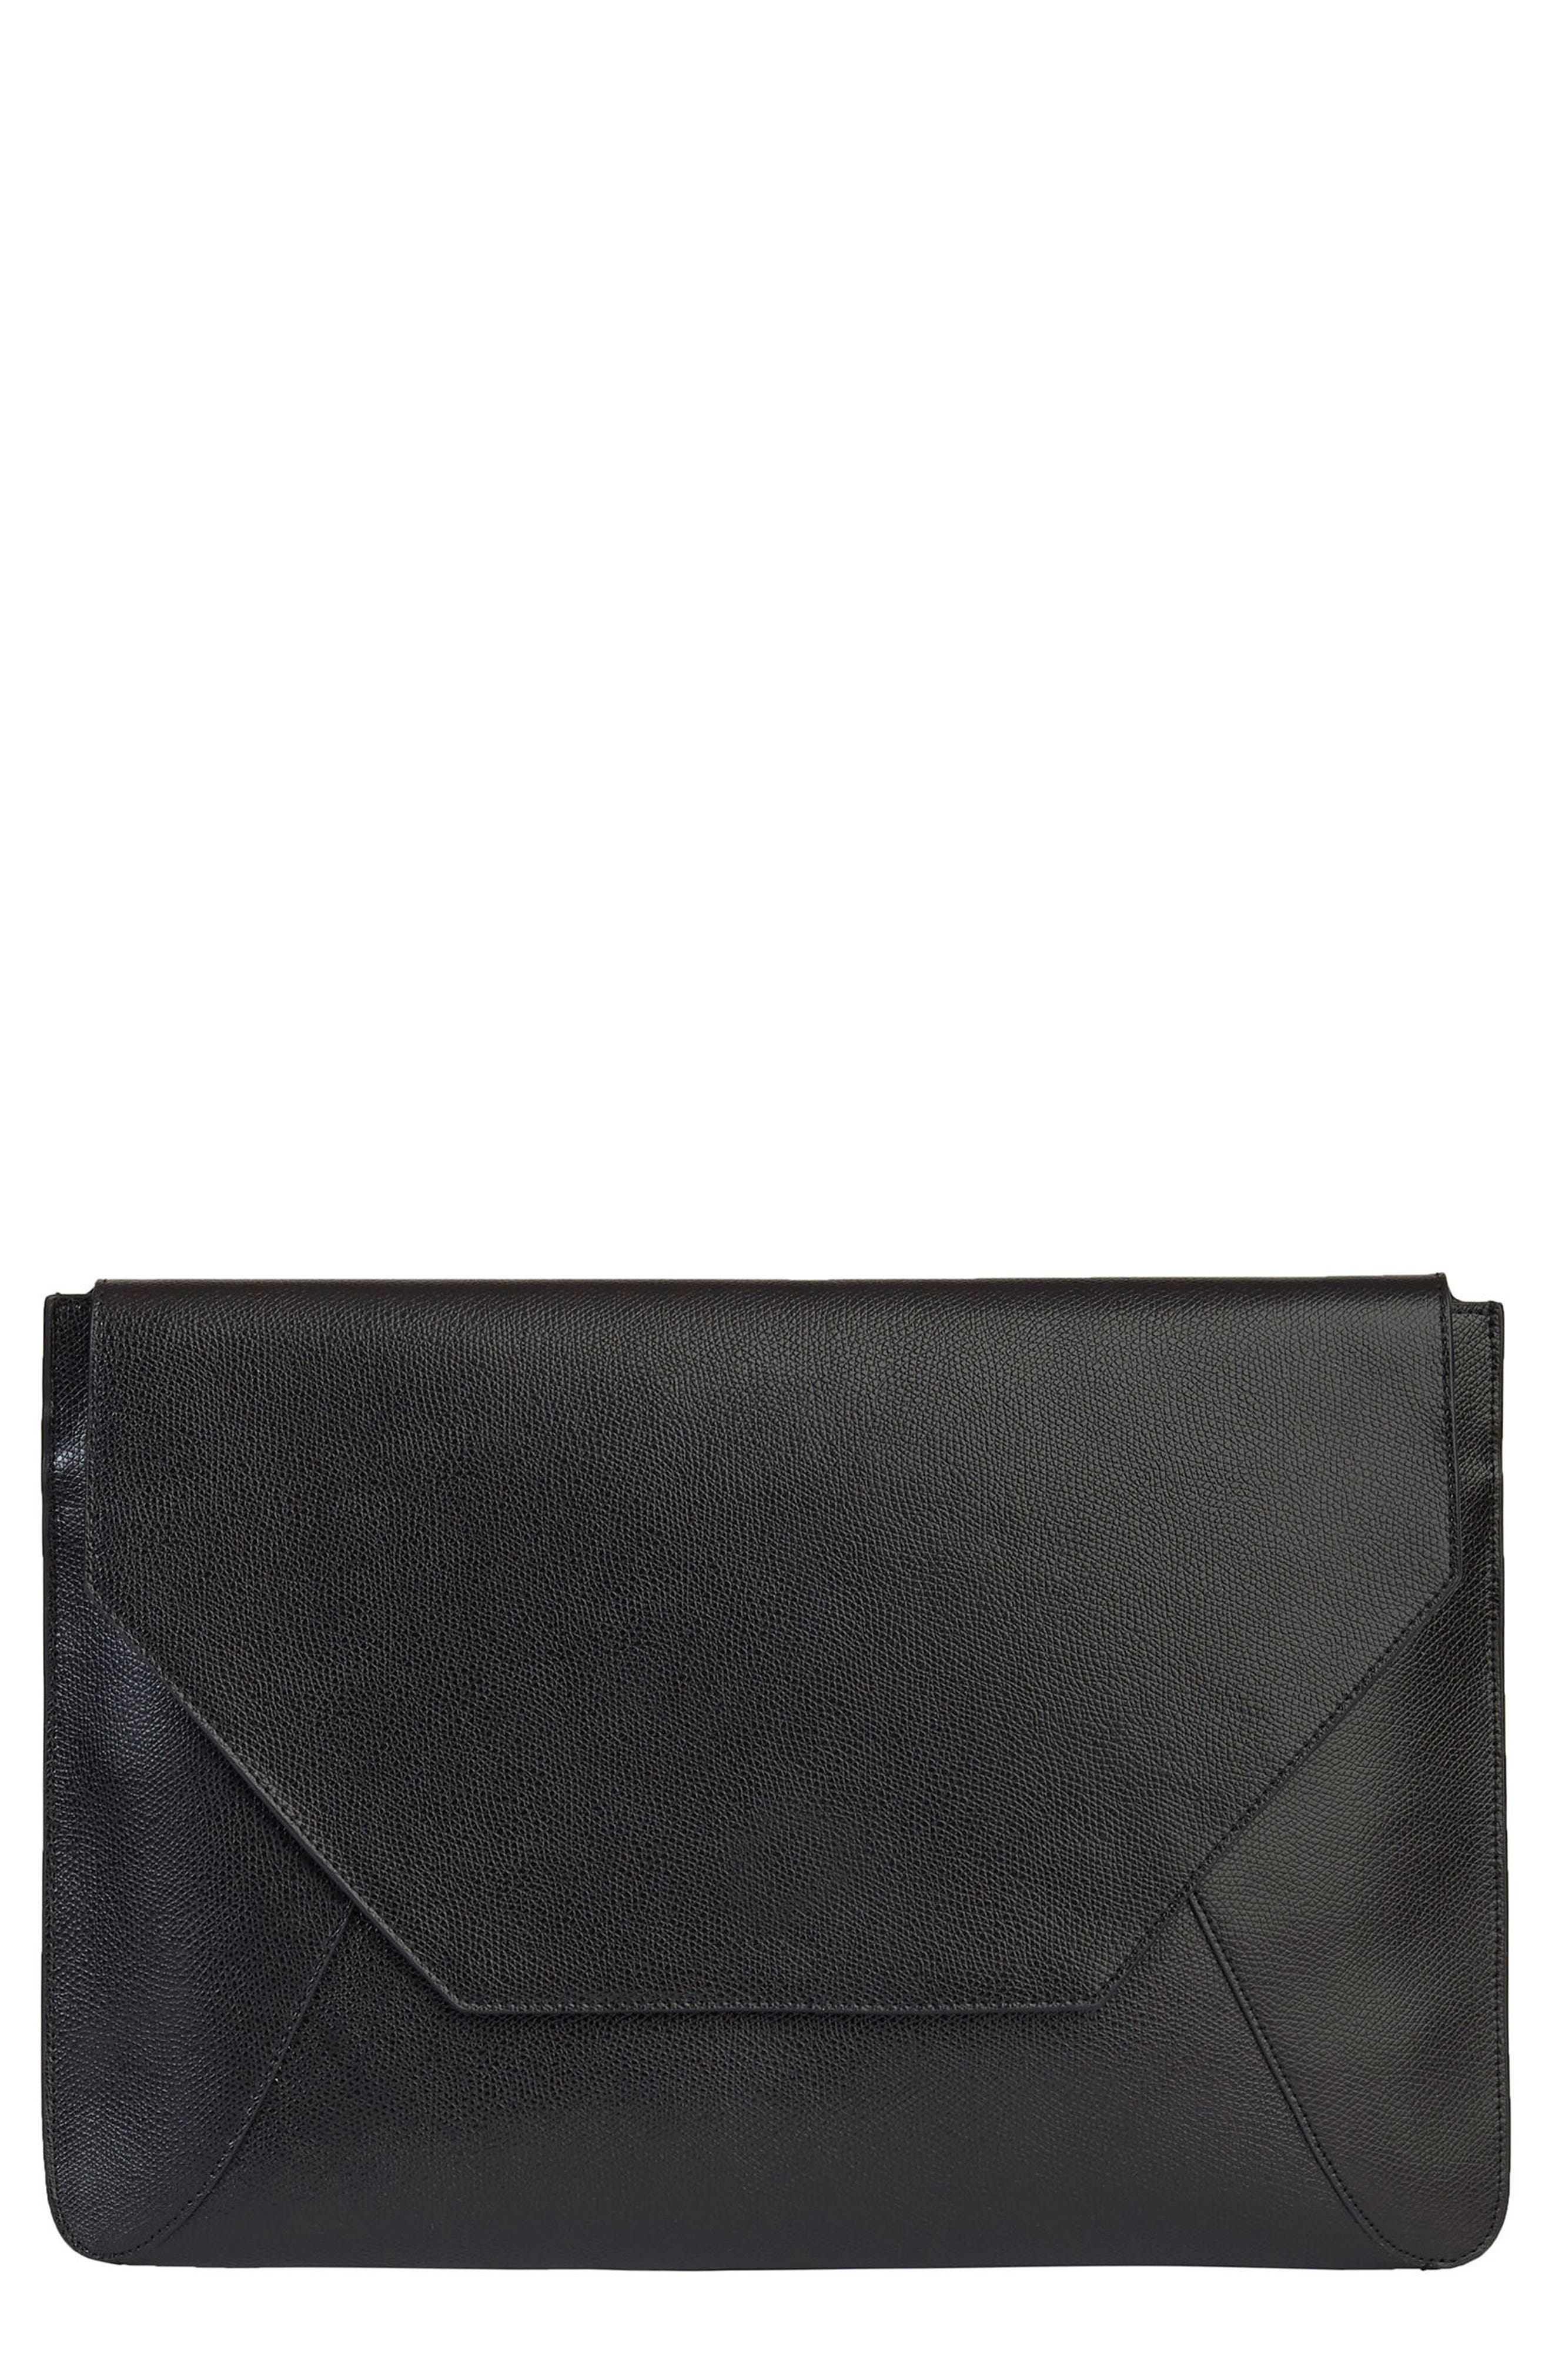 Pebbled Leather Envelope Clutch,                             Main thumbnail 1, color,                             001